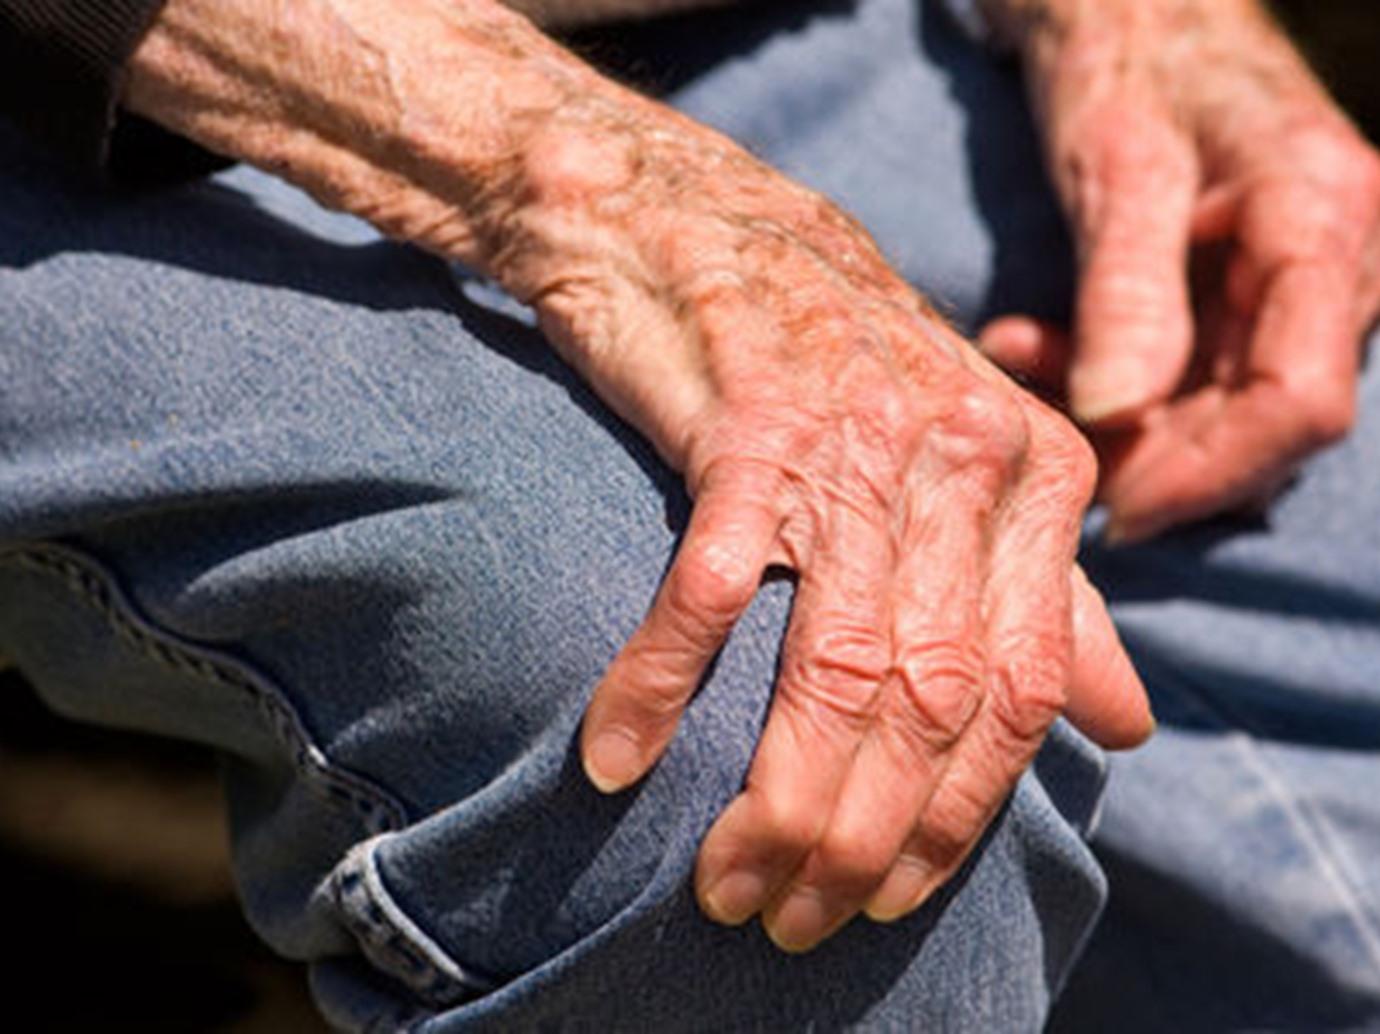 صورة مرض باركنسون , تعرف علي اسباب وطرق علاج مرض باركنسون